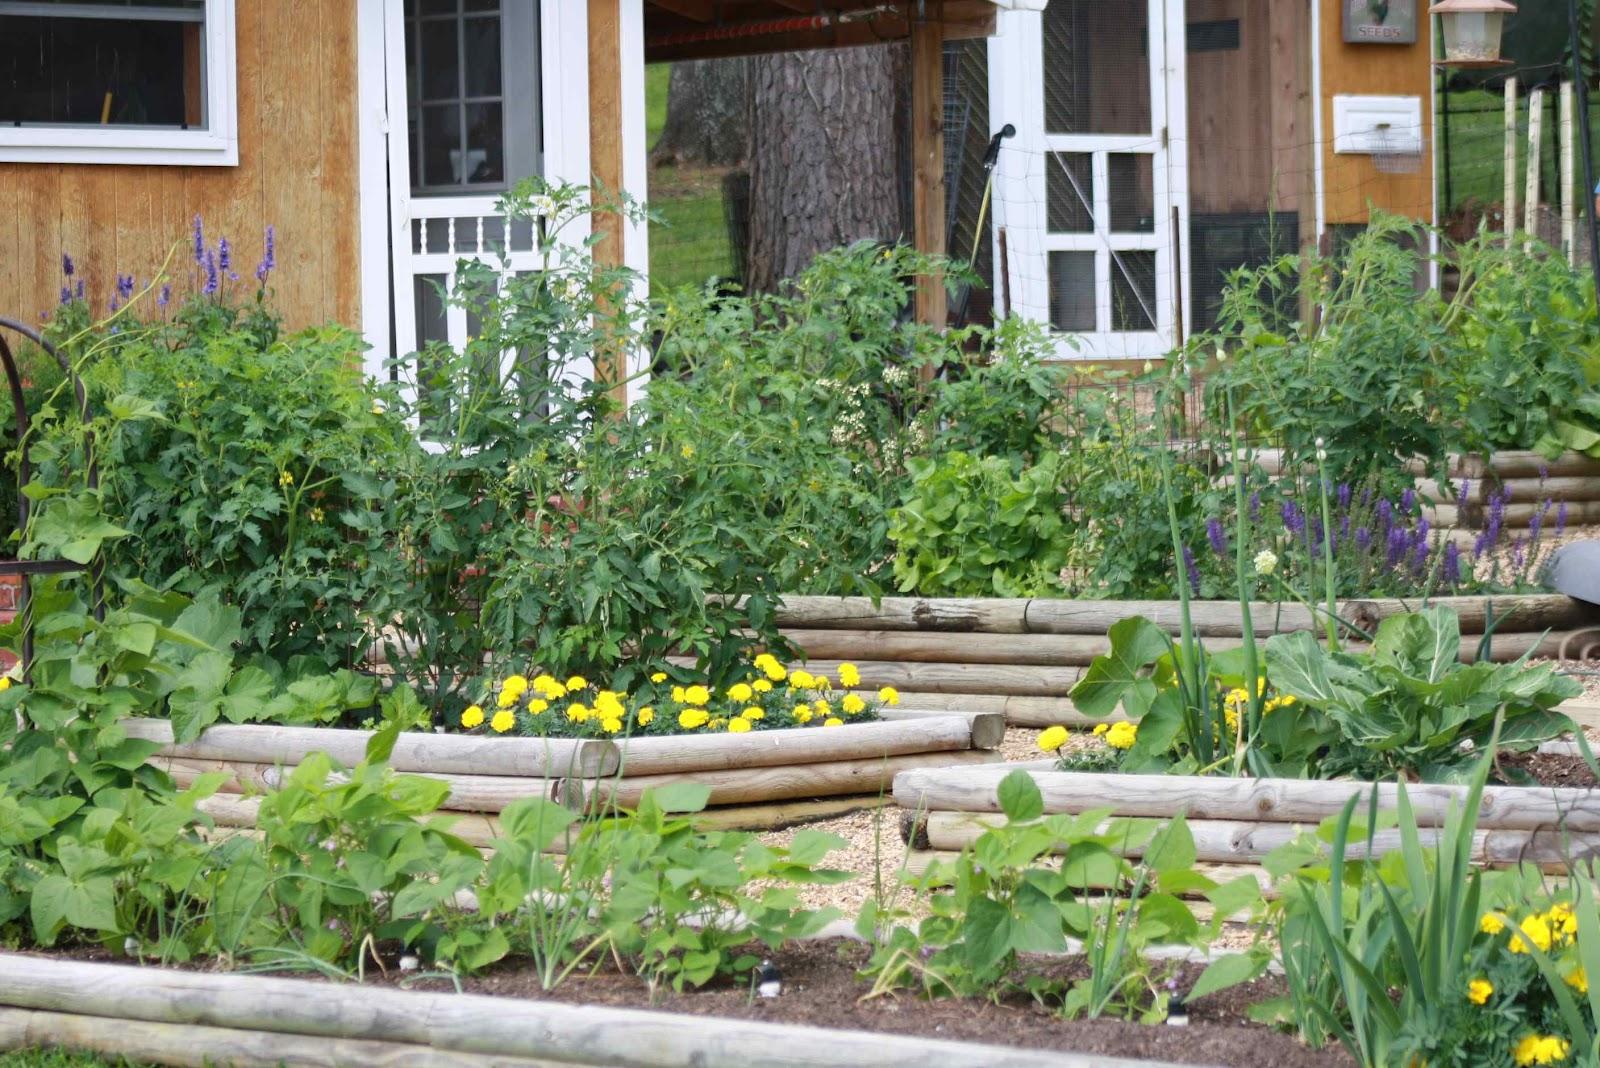 Roses and other gardening joys lakeside living garden tour for Fruit and vegetable garden